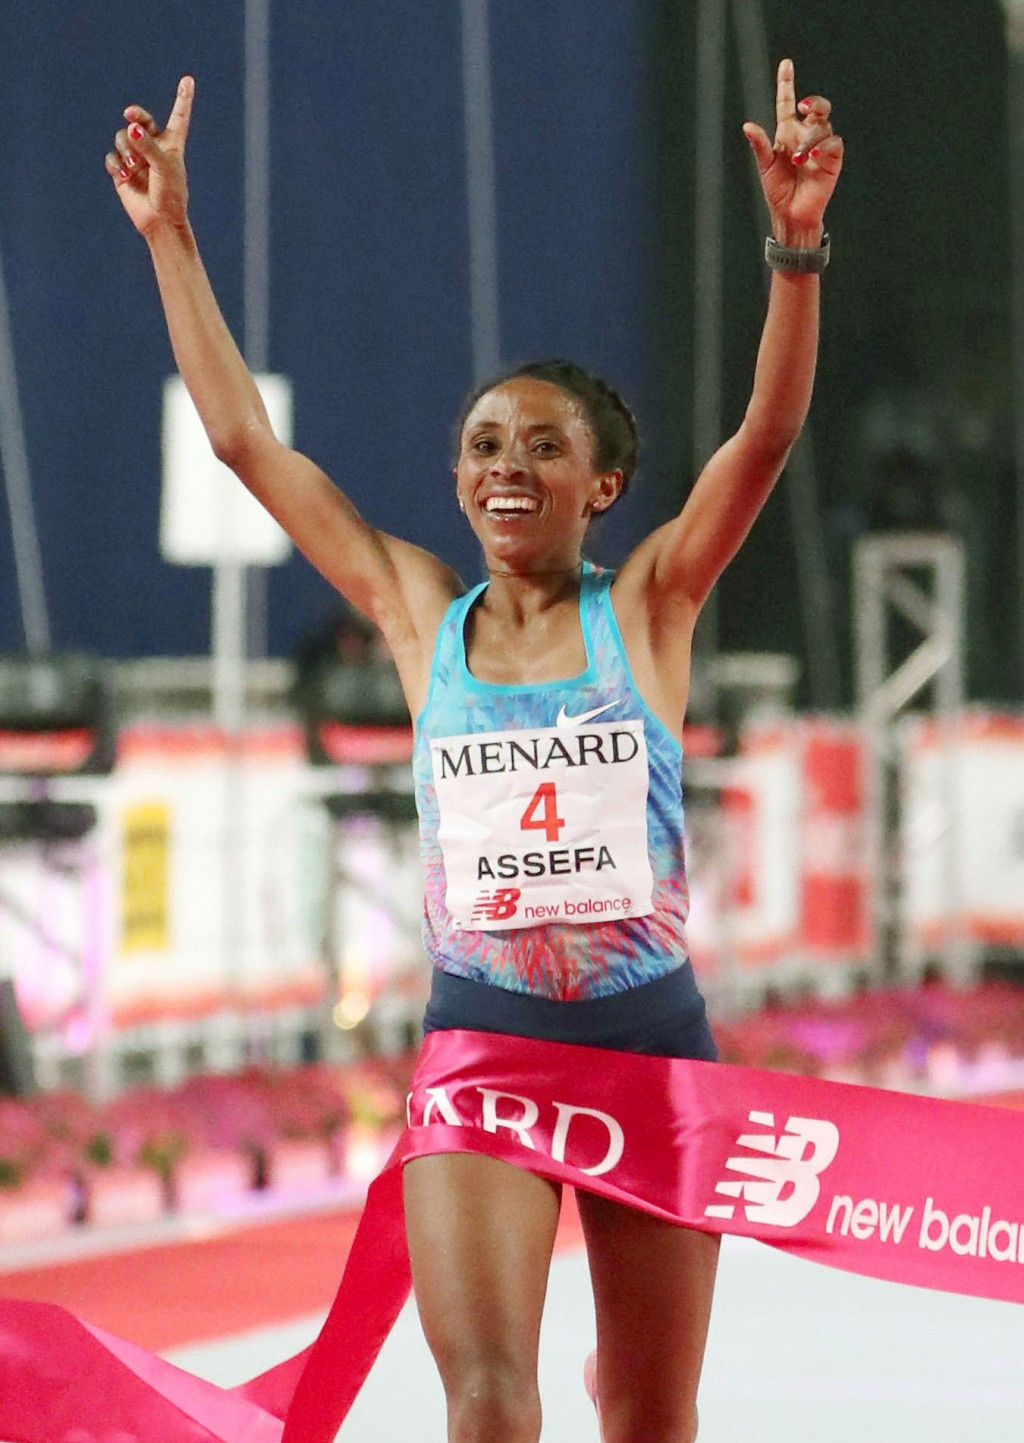 Meskerem Assefa of Ethiopia crosses the finish line, winning Nagoya Women's Marathon in Nagoya, central Japan, Sunday, March 11, 2018.  Assefa won wit